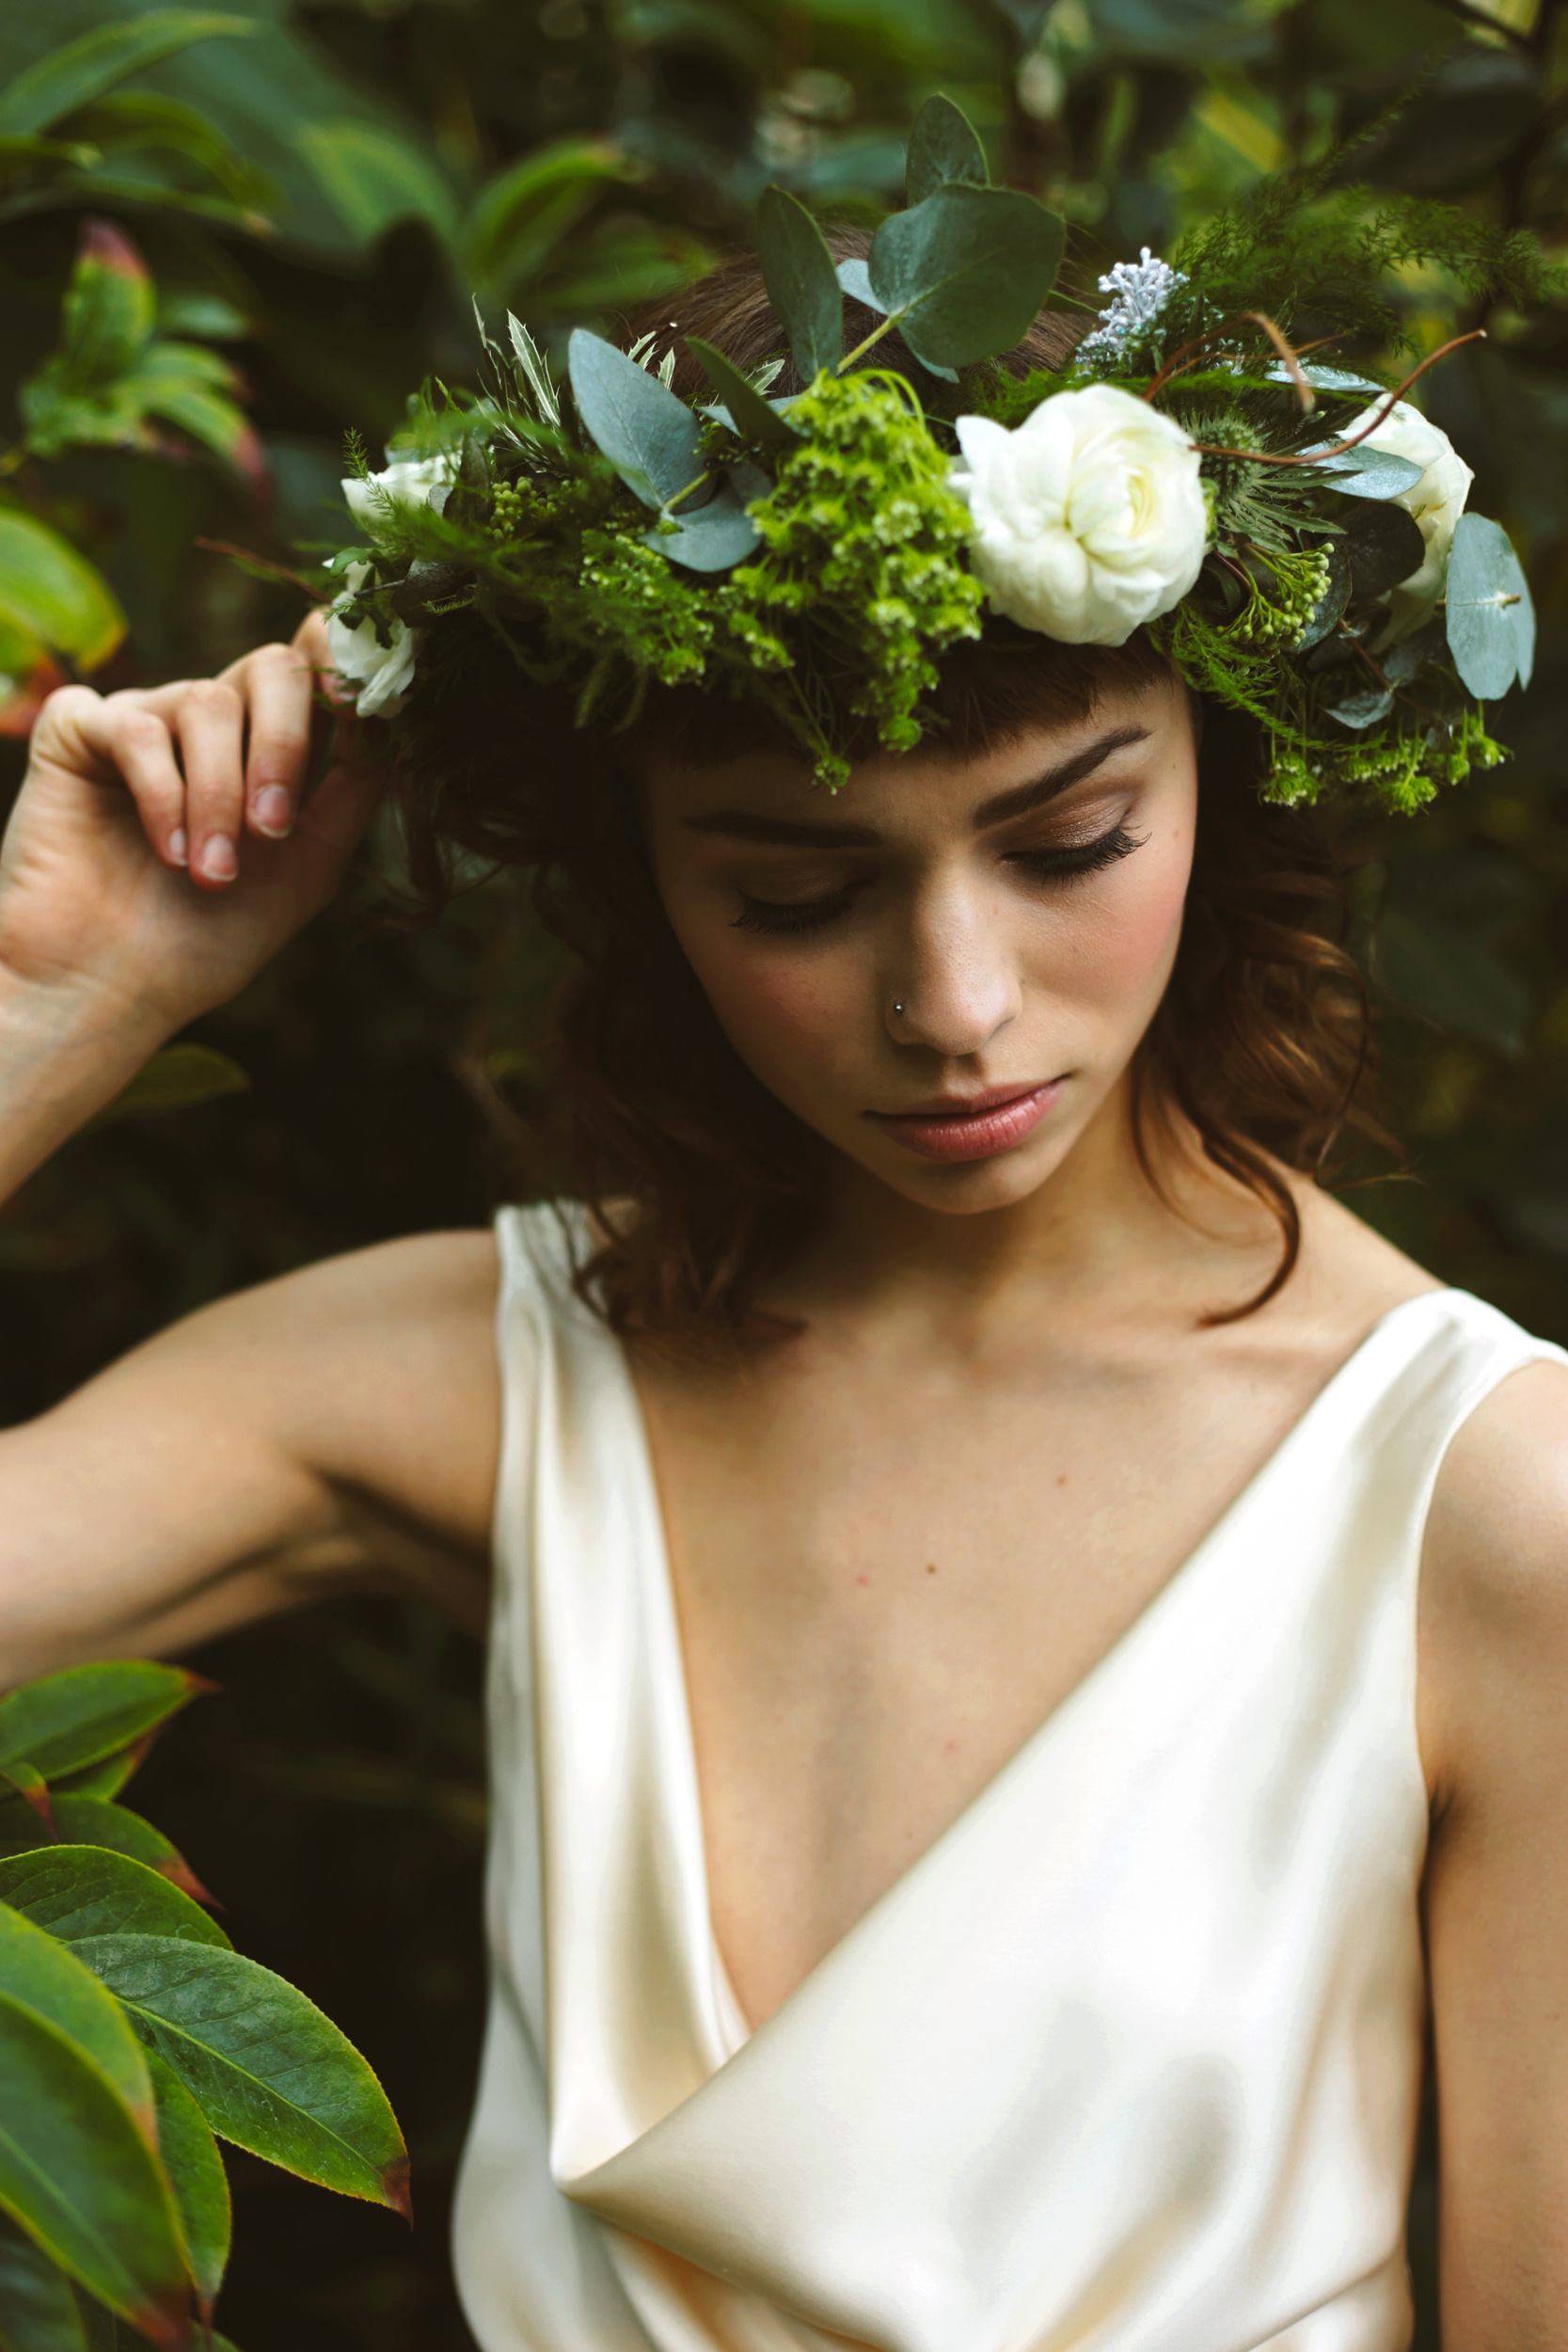 Winter-Bridal-Kate-Beaumont-Shelley-Richmond-Vintage-Wedding-Dress-2.jpg